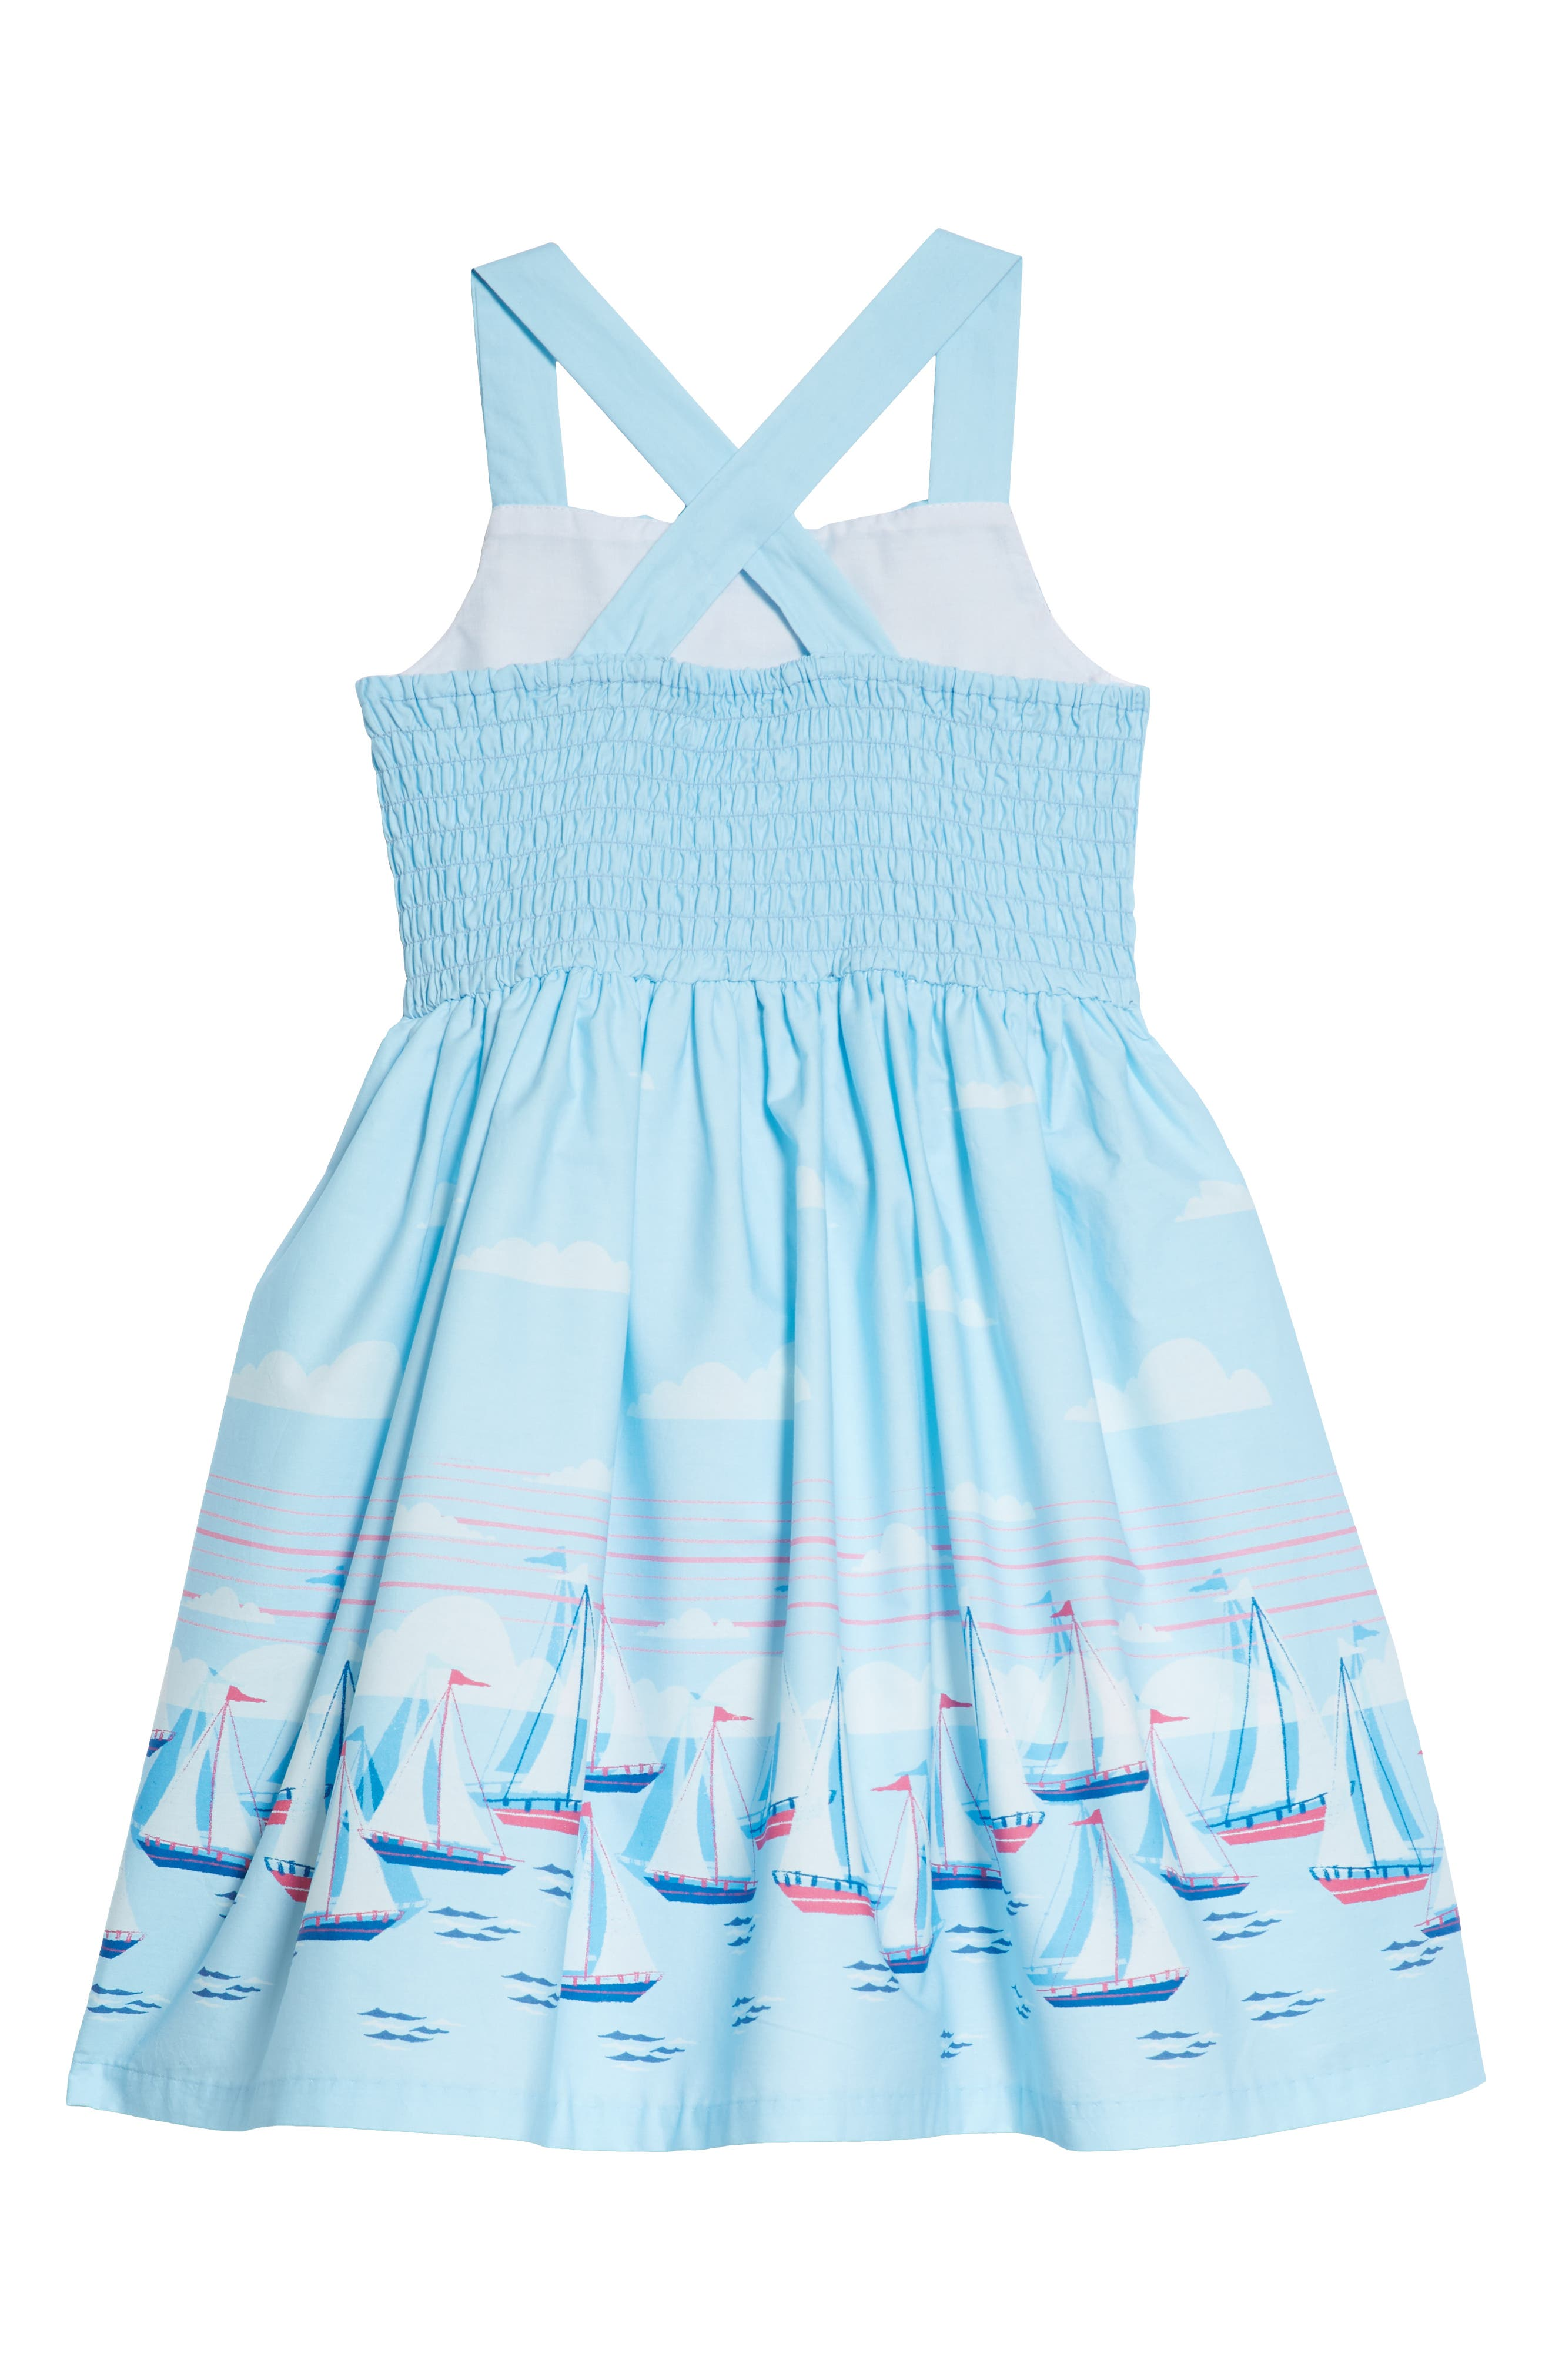 Sailboat Dress,                             Alternate thumbnail 2, color,                             400